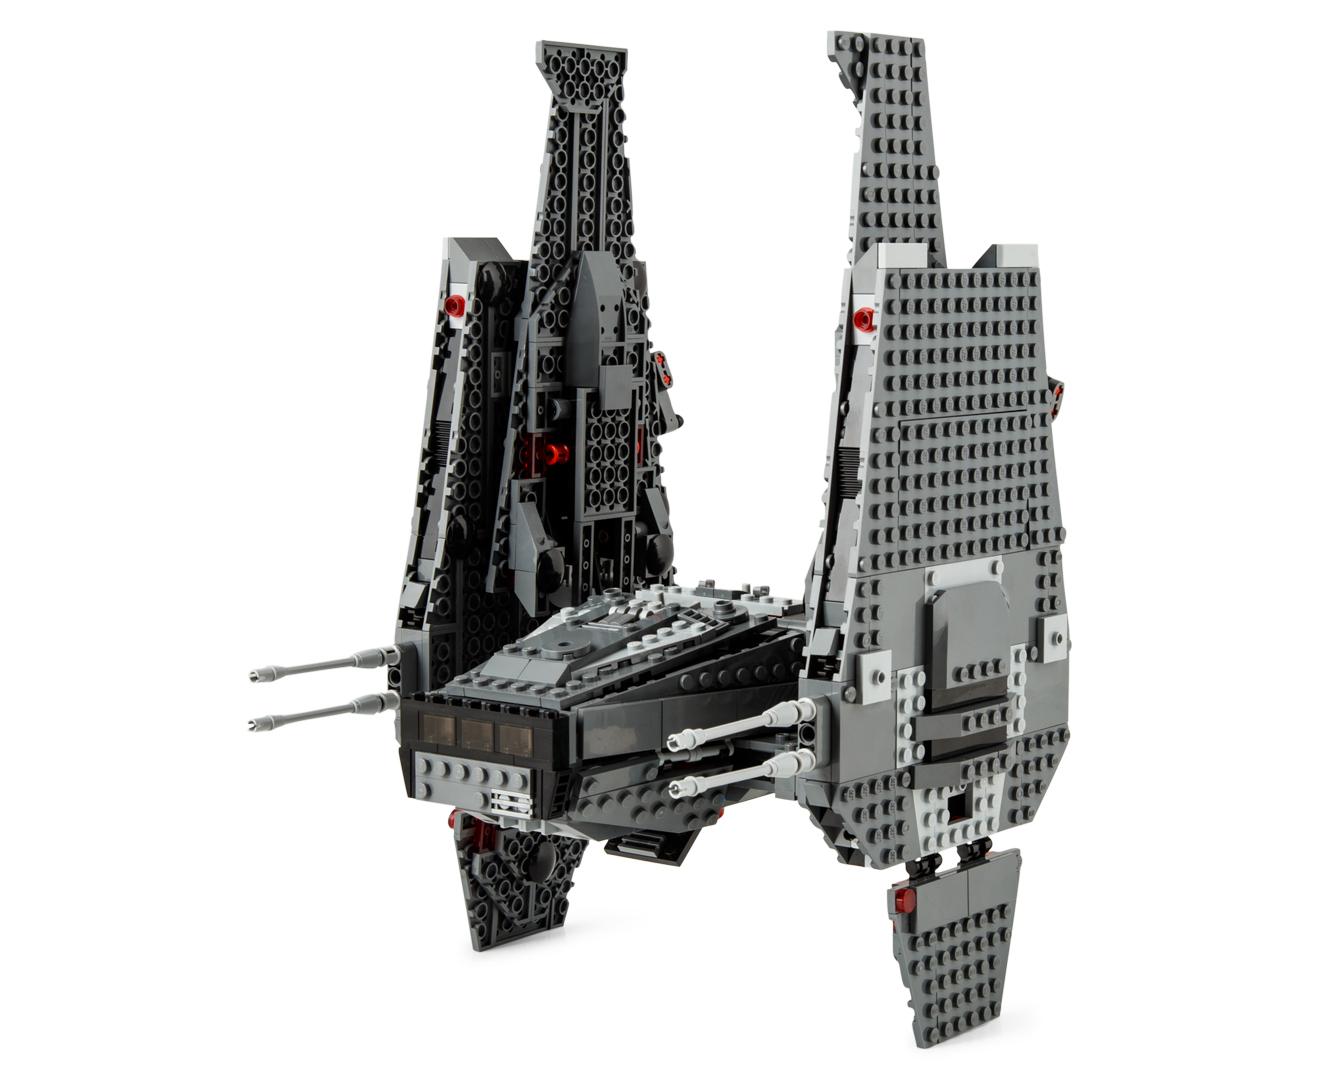 kylo ren space shuttle lego - photo #13